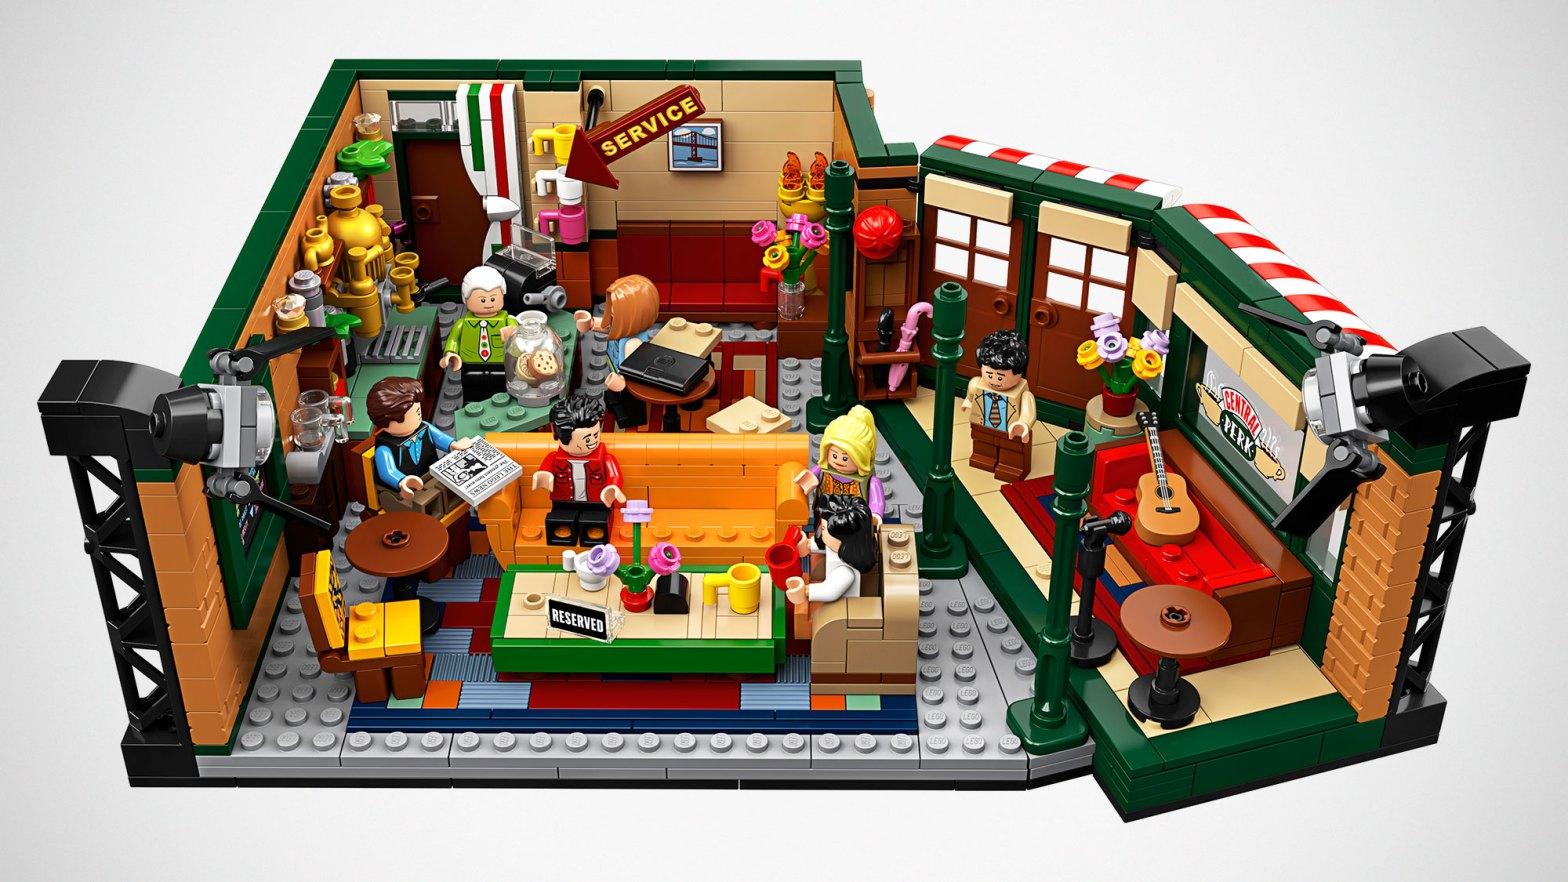 LEGO Ideas 21319 Central Perk Set